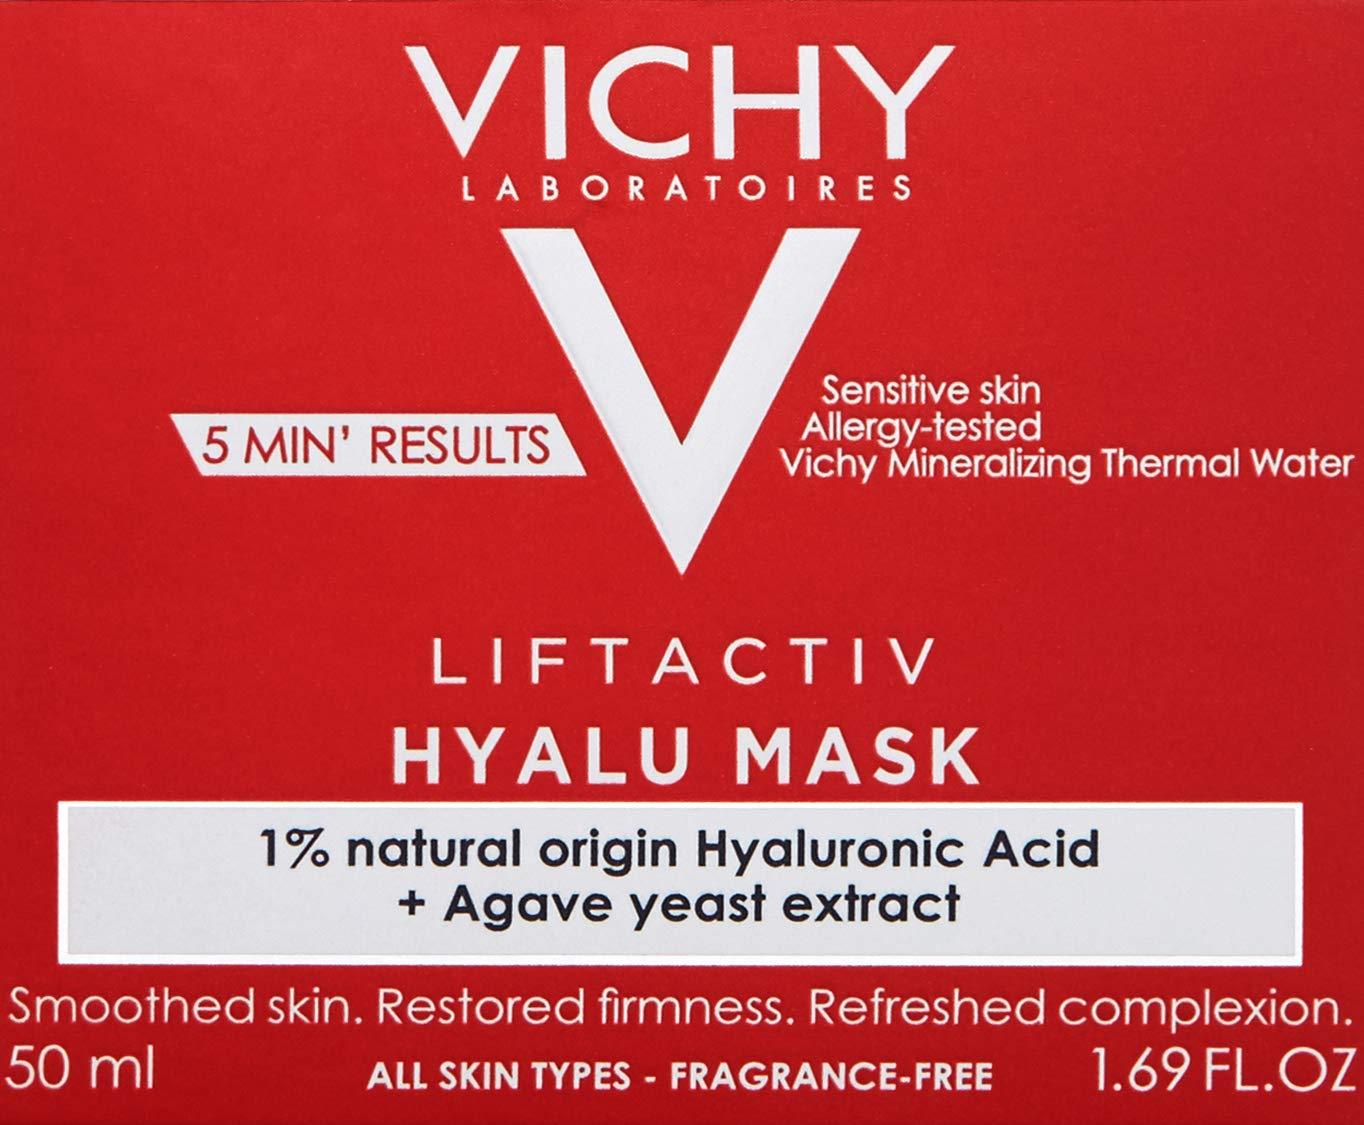 L'Oreal Vichy Mascarilla Facial 50 ml